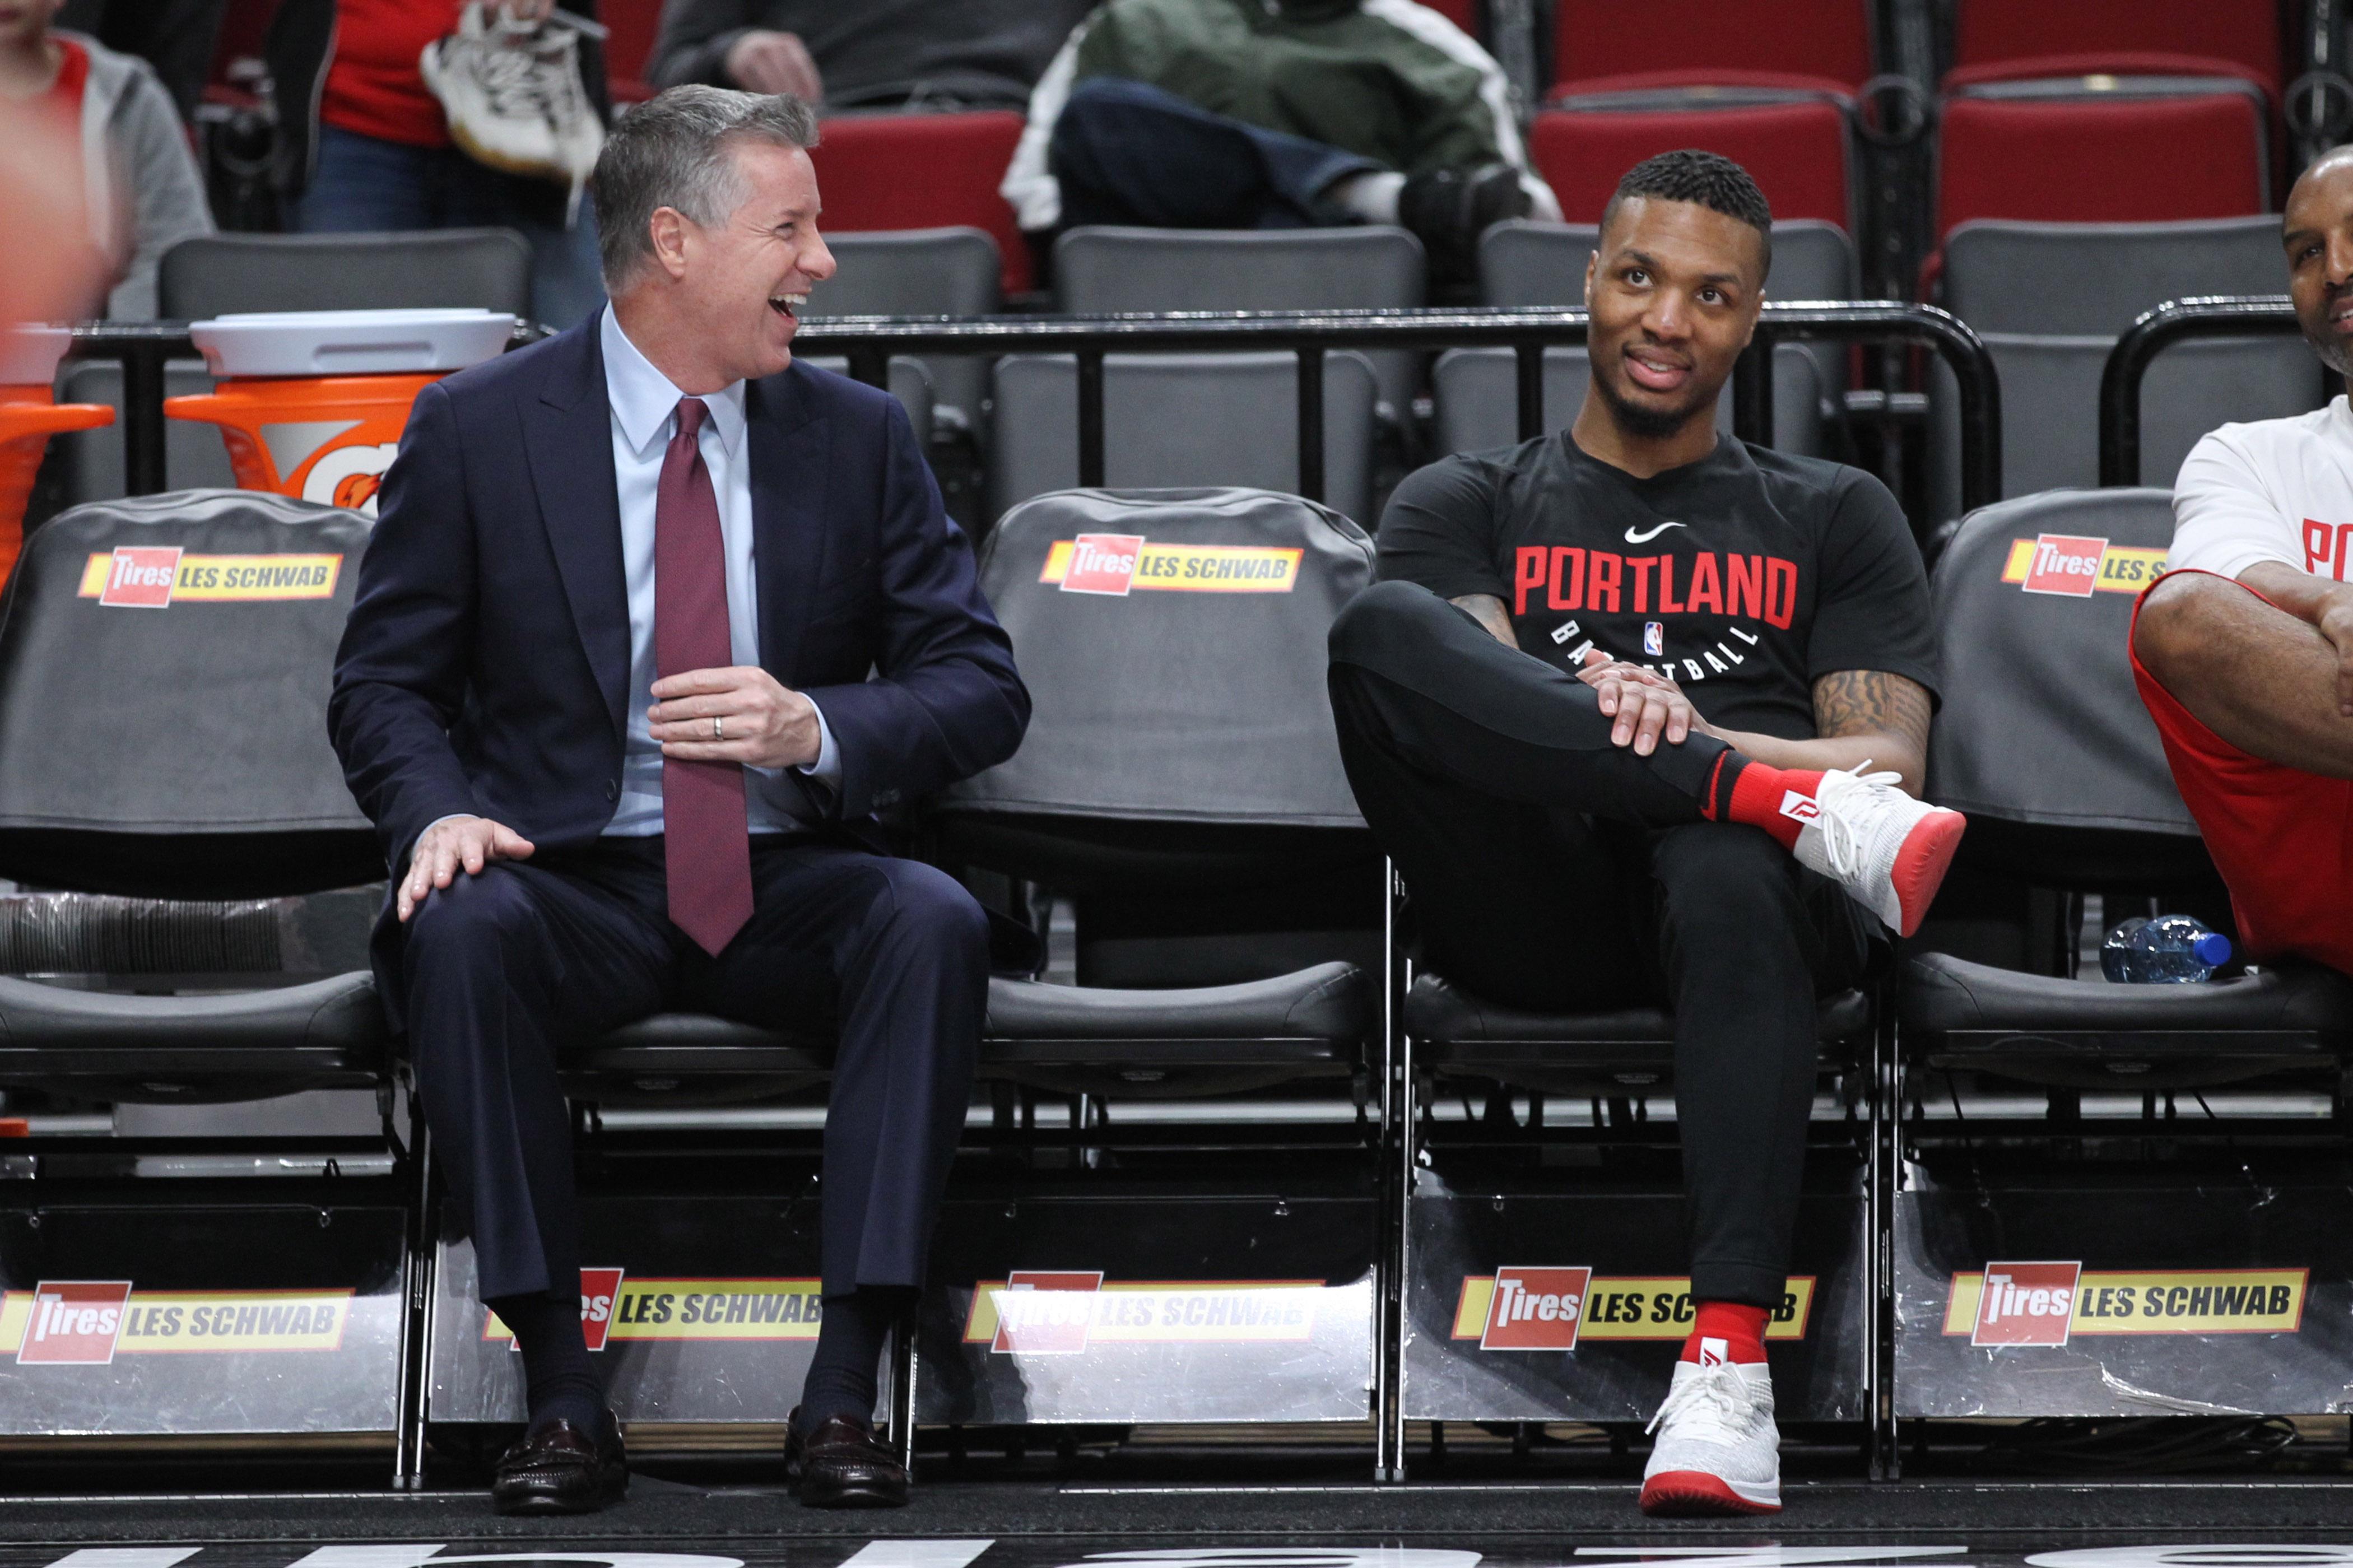 Portland Trail Blazers Schedule 2020-21 NBA Salary Cap Will Remain Unchanged in 2019 2020, Drop in 2020 21